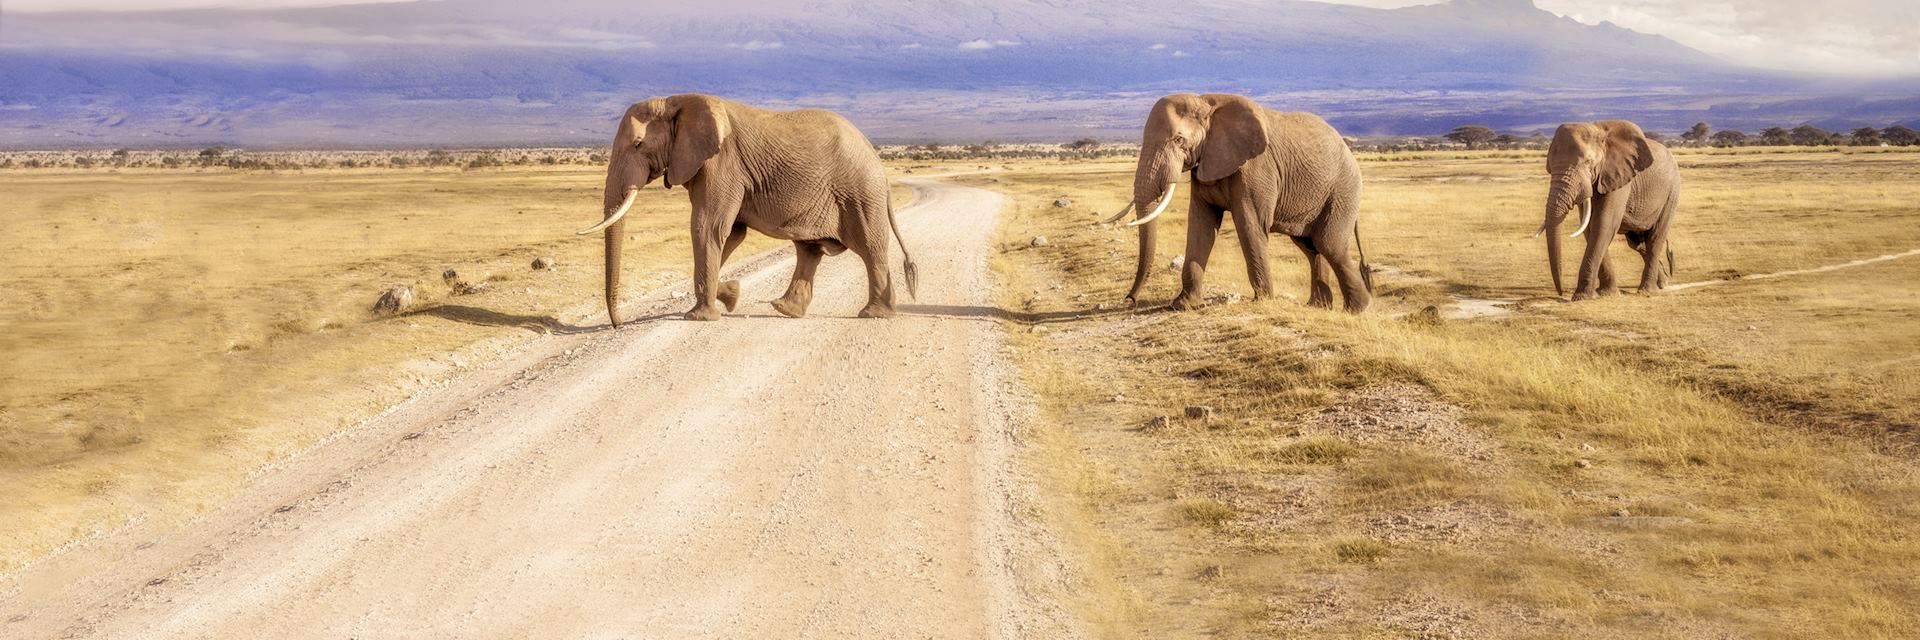 Elephant herd crossing a road